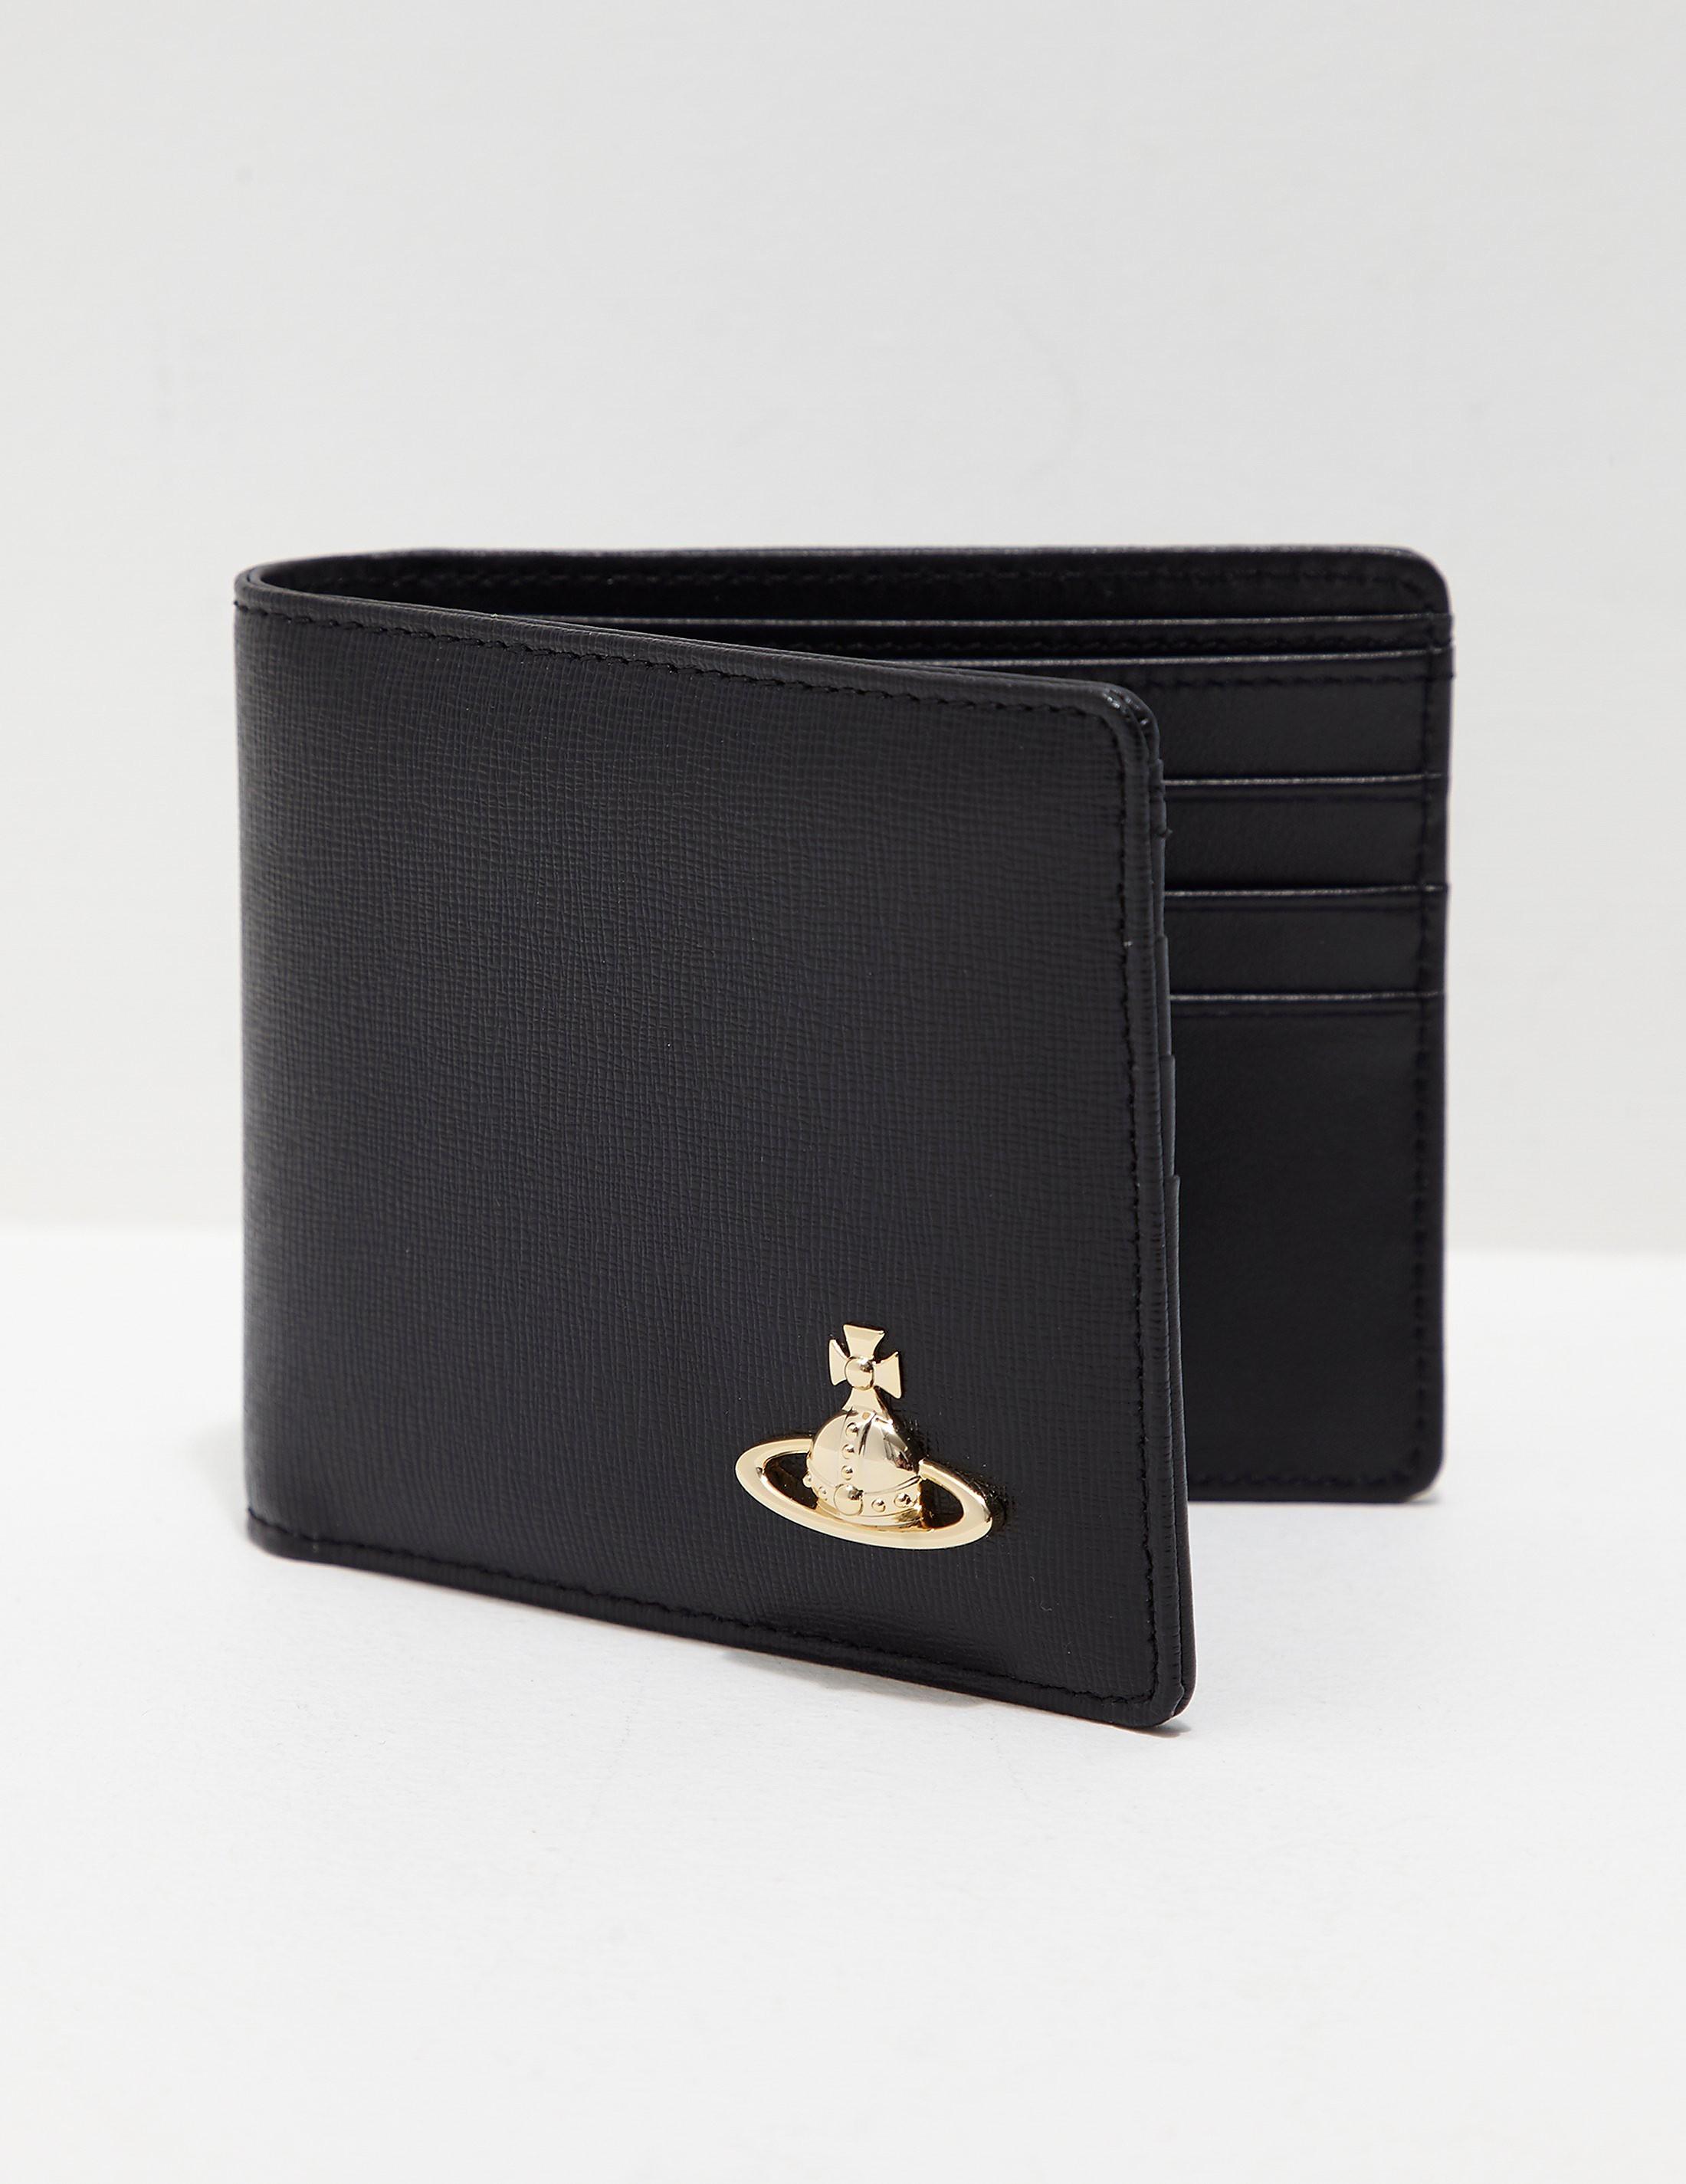 Vivienne Westwood Saffiano Wallet